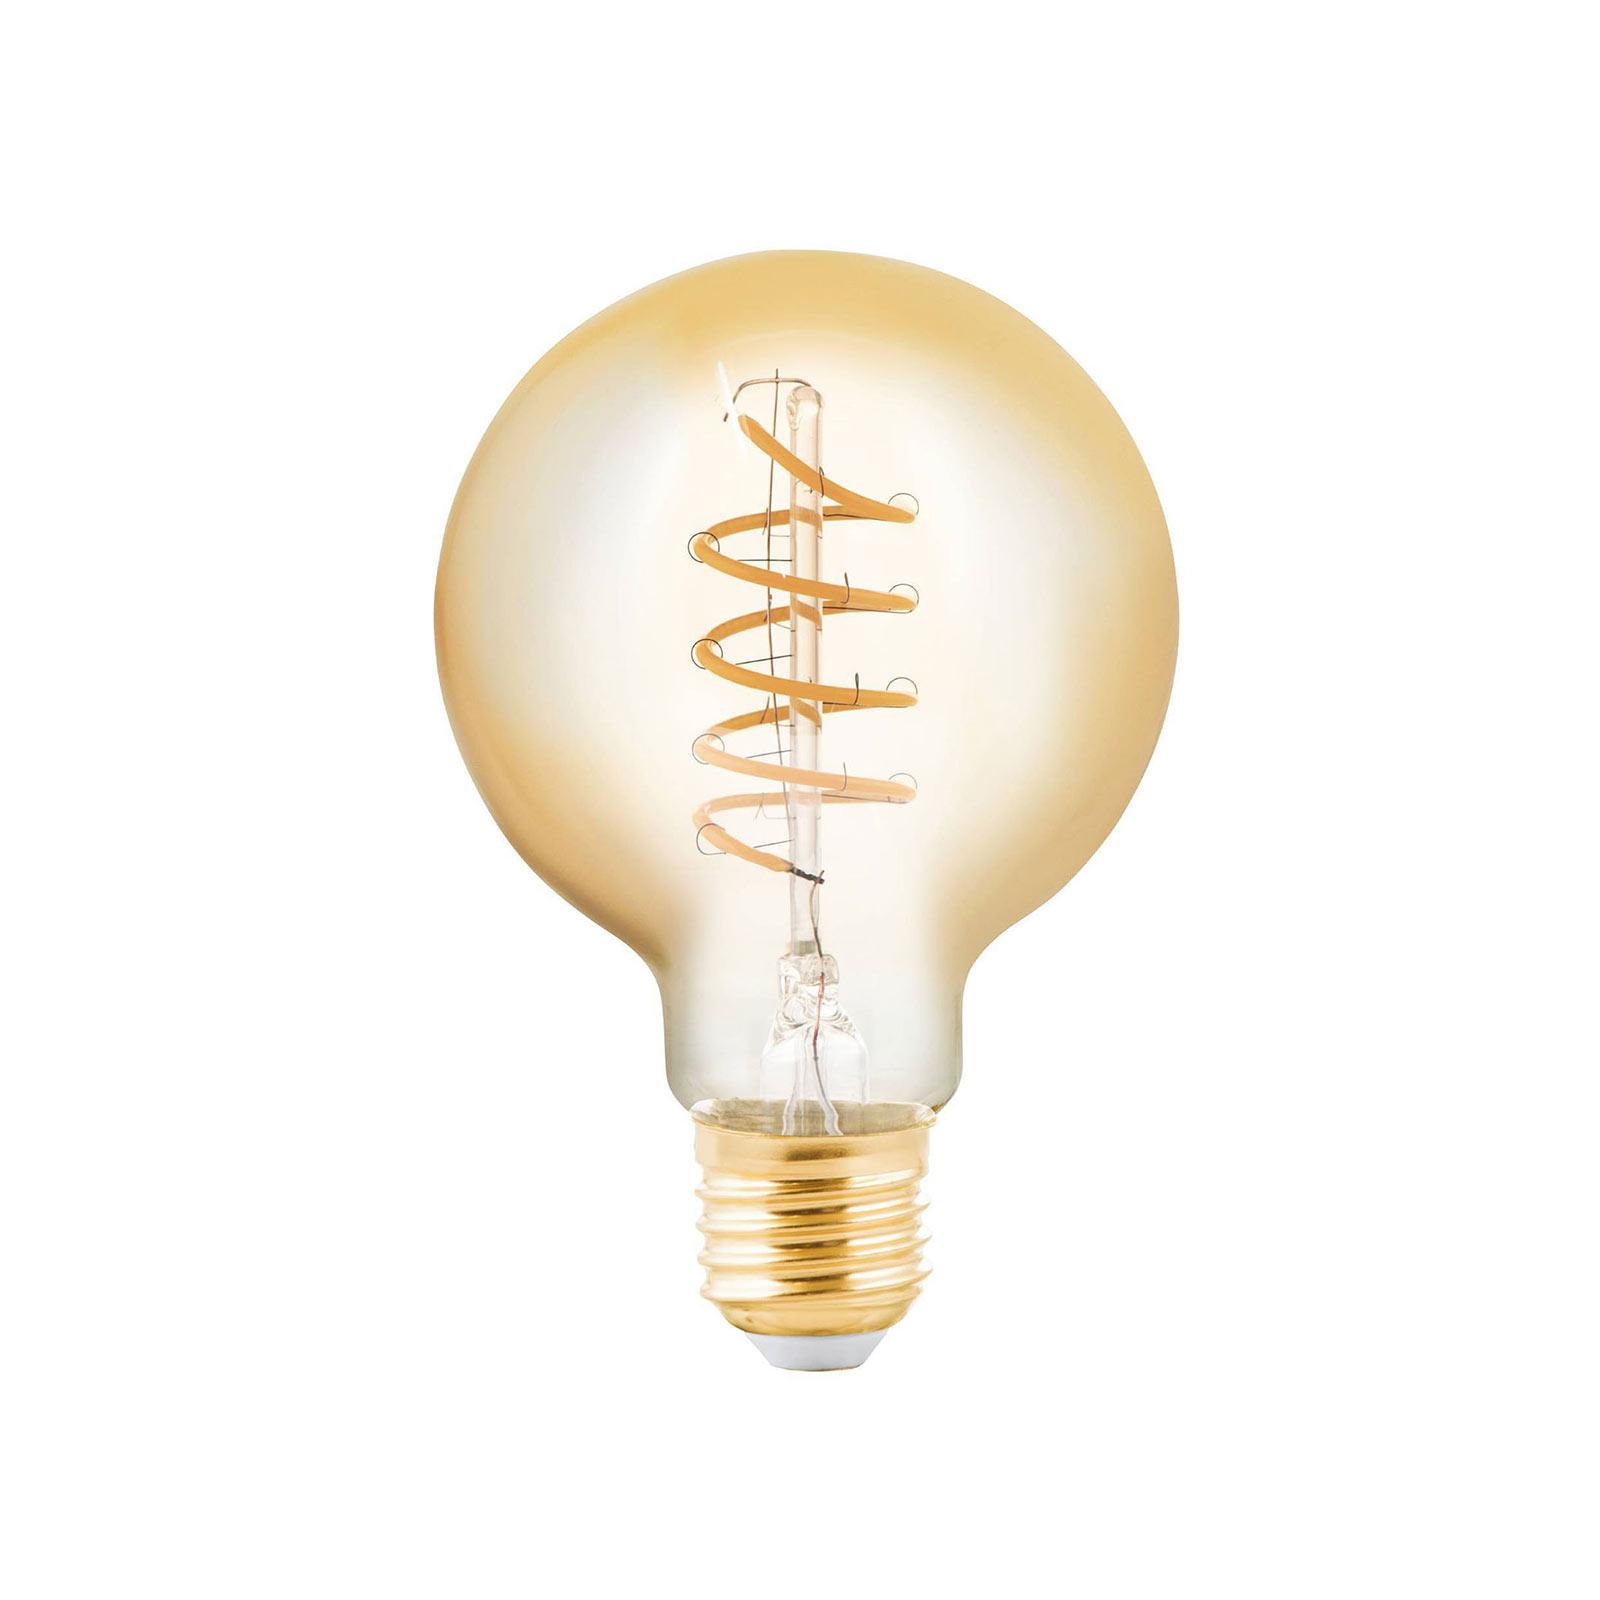 EGLO LED žárovka Globe E27 4W jantarová Ø 8 cm